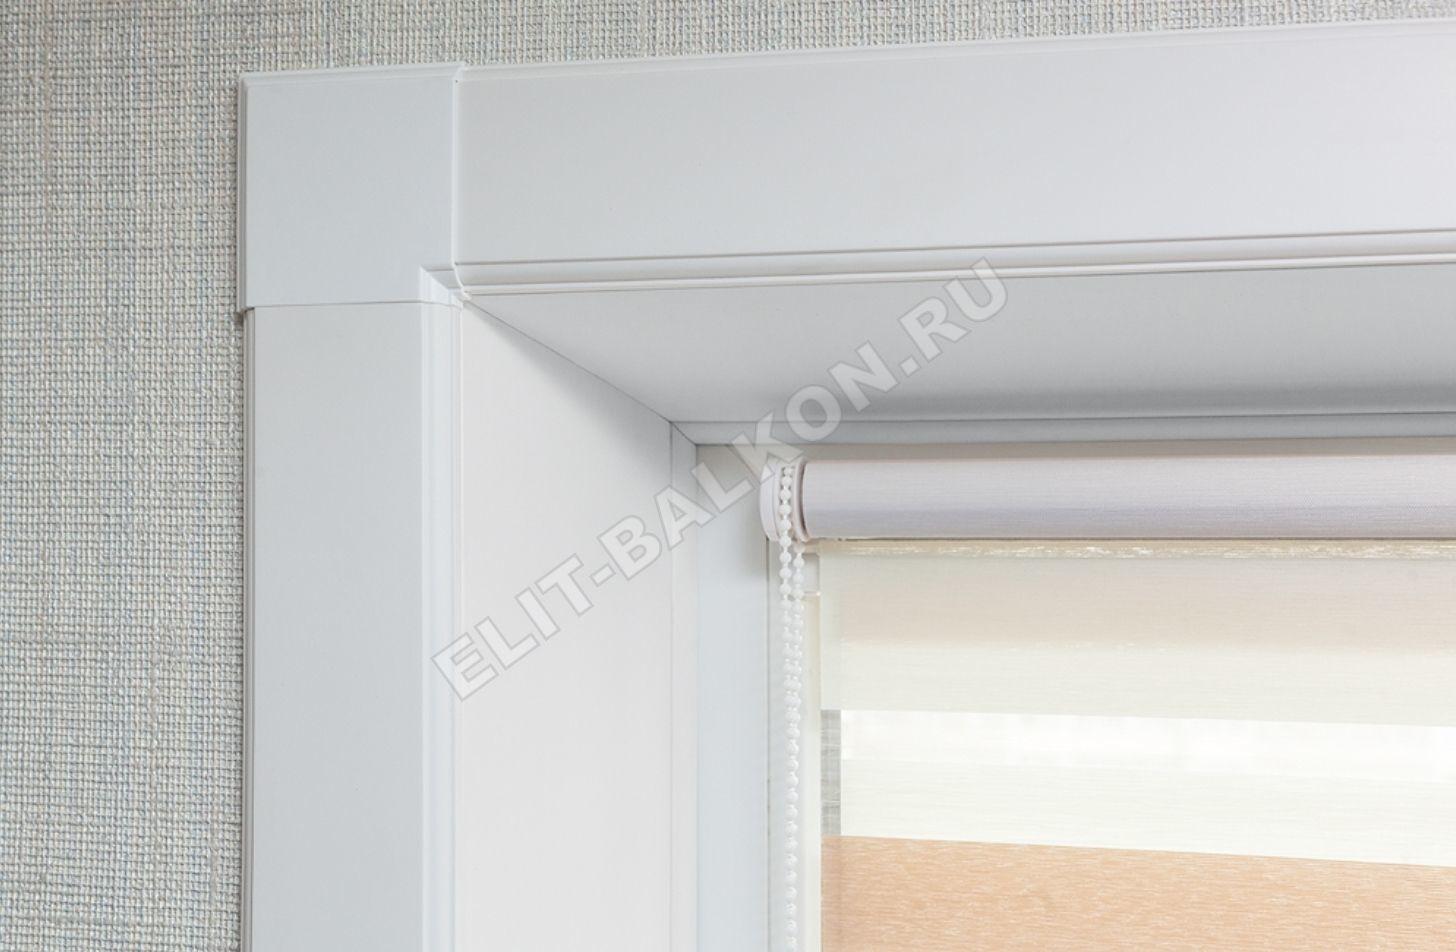 Vnutrennie otkosy na okna PVH QUNELL TSVET BELYJ 1 17 1 1 - Внутренние откосы «Qunell» на окна ПВХ